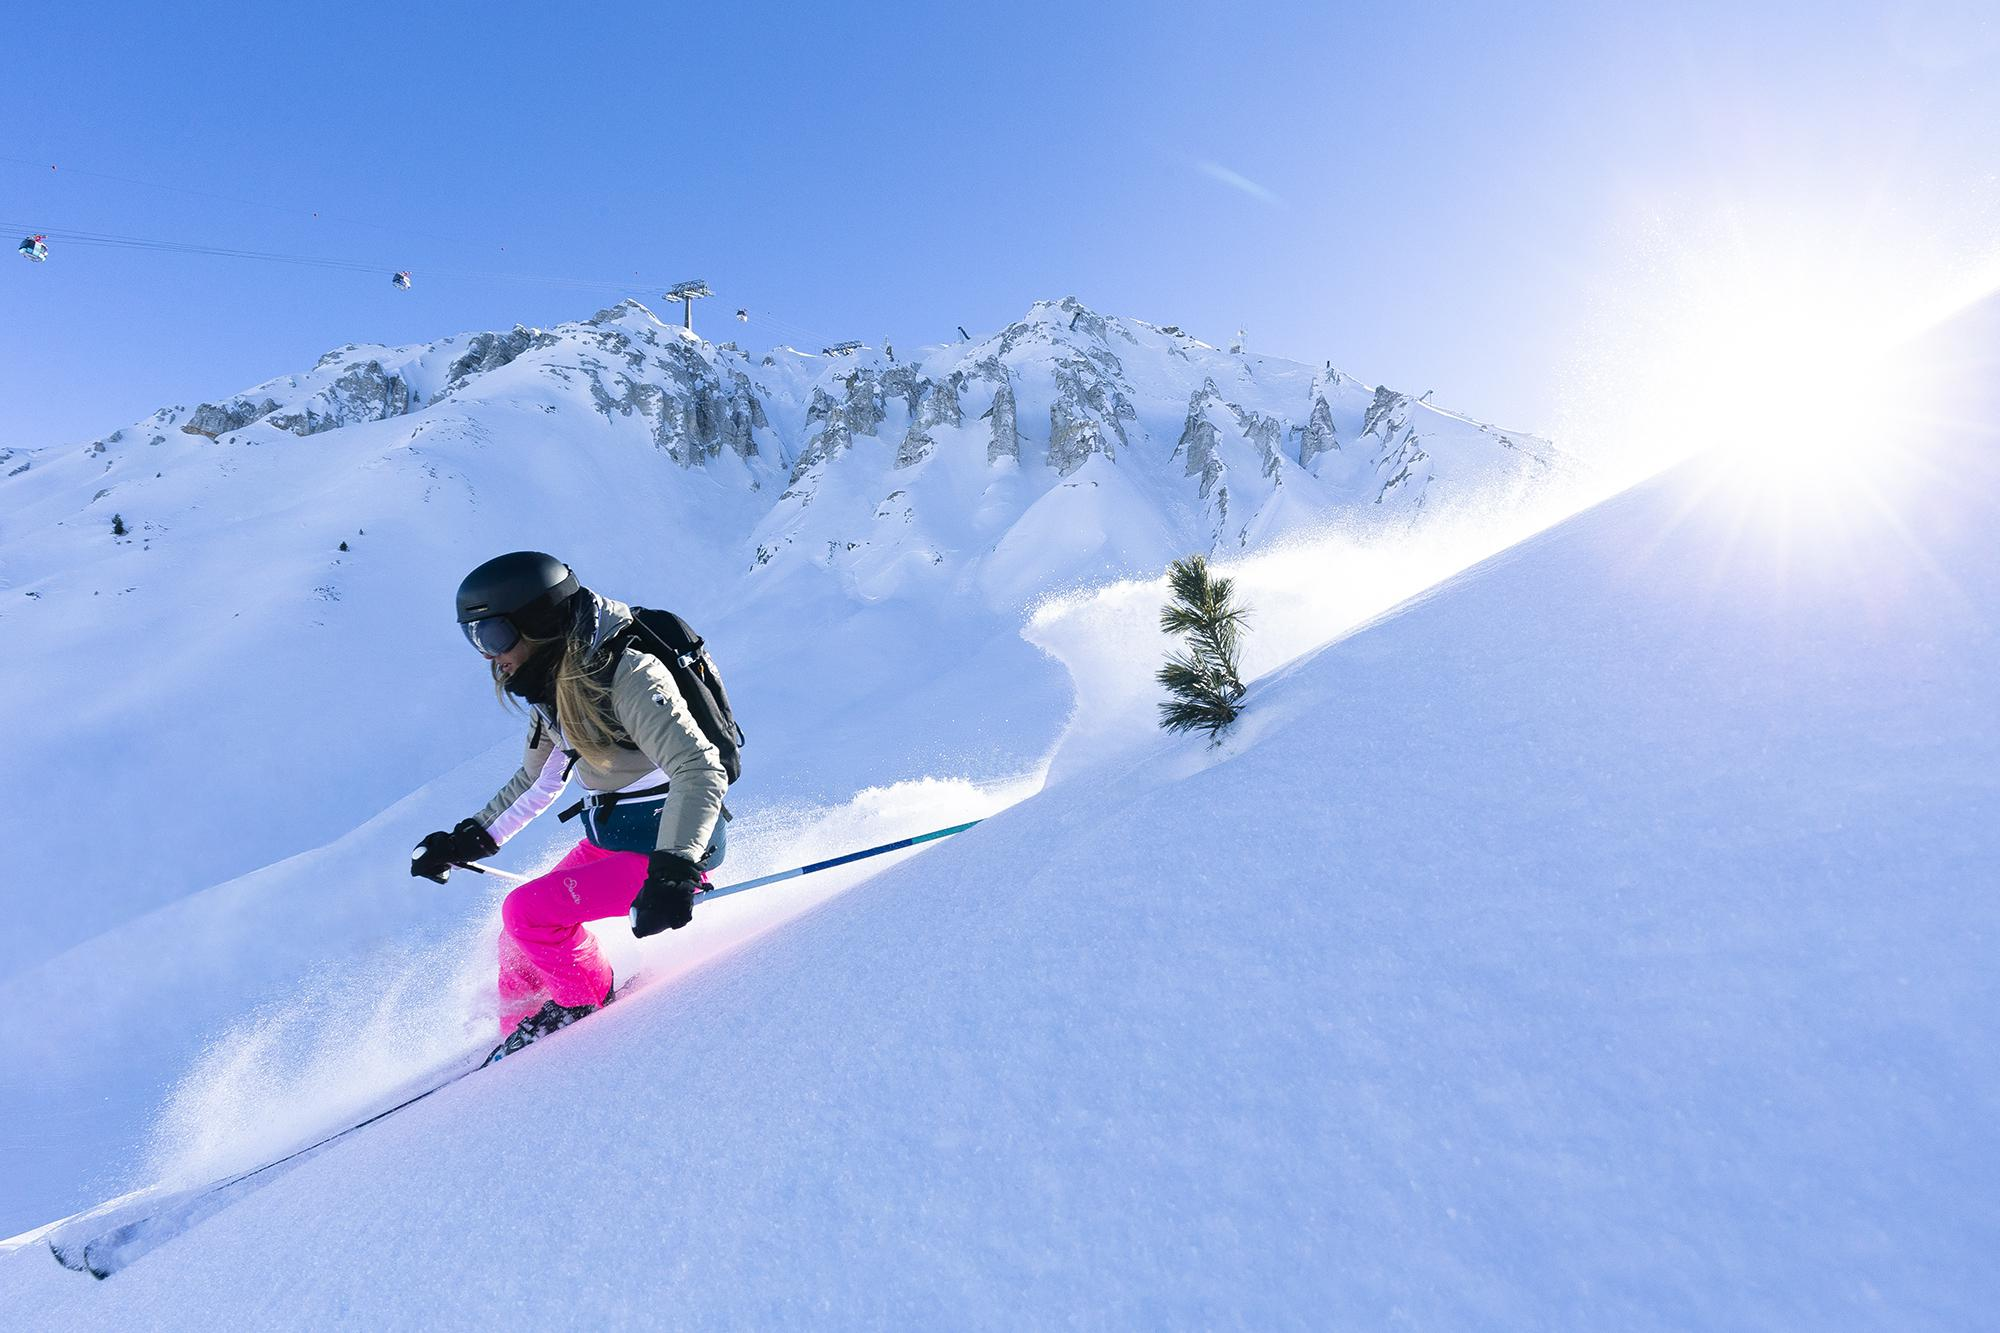 skiort Champagny-en-Vanoise